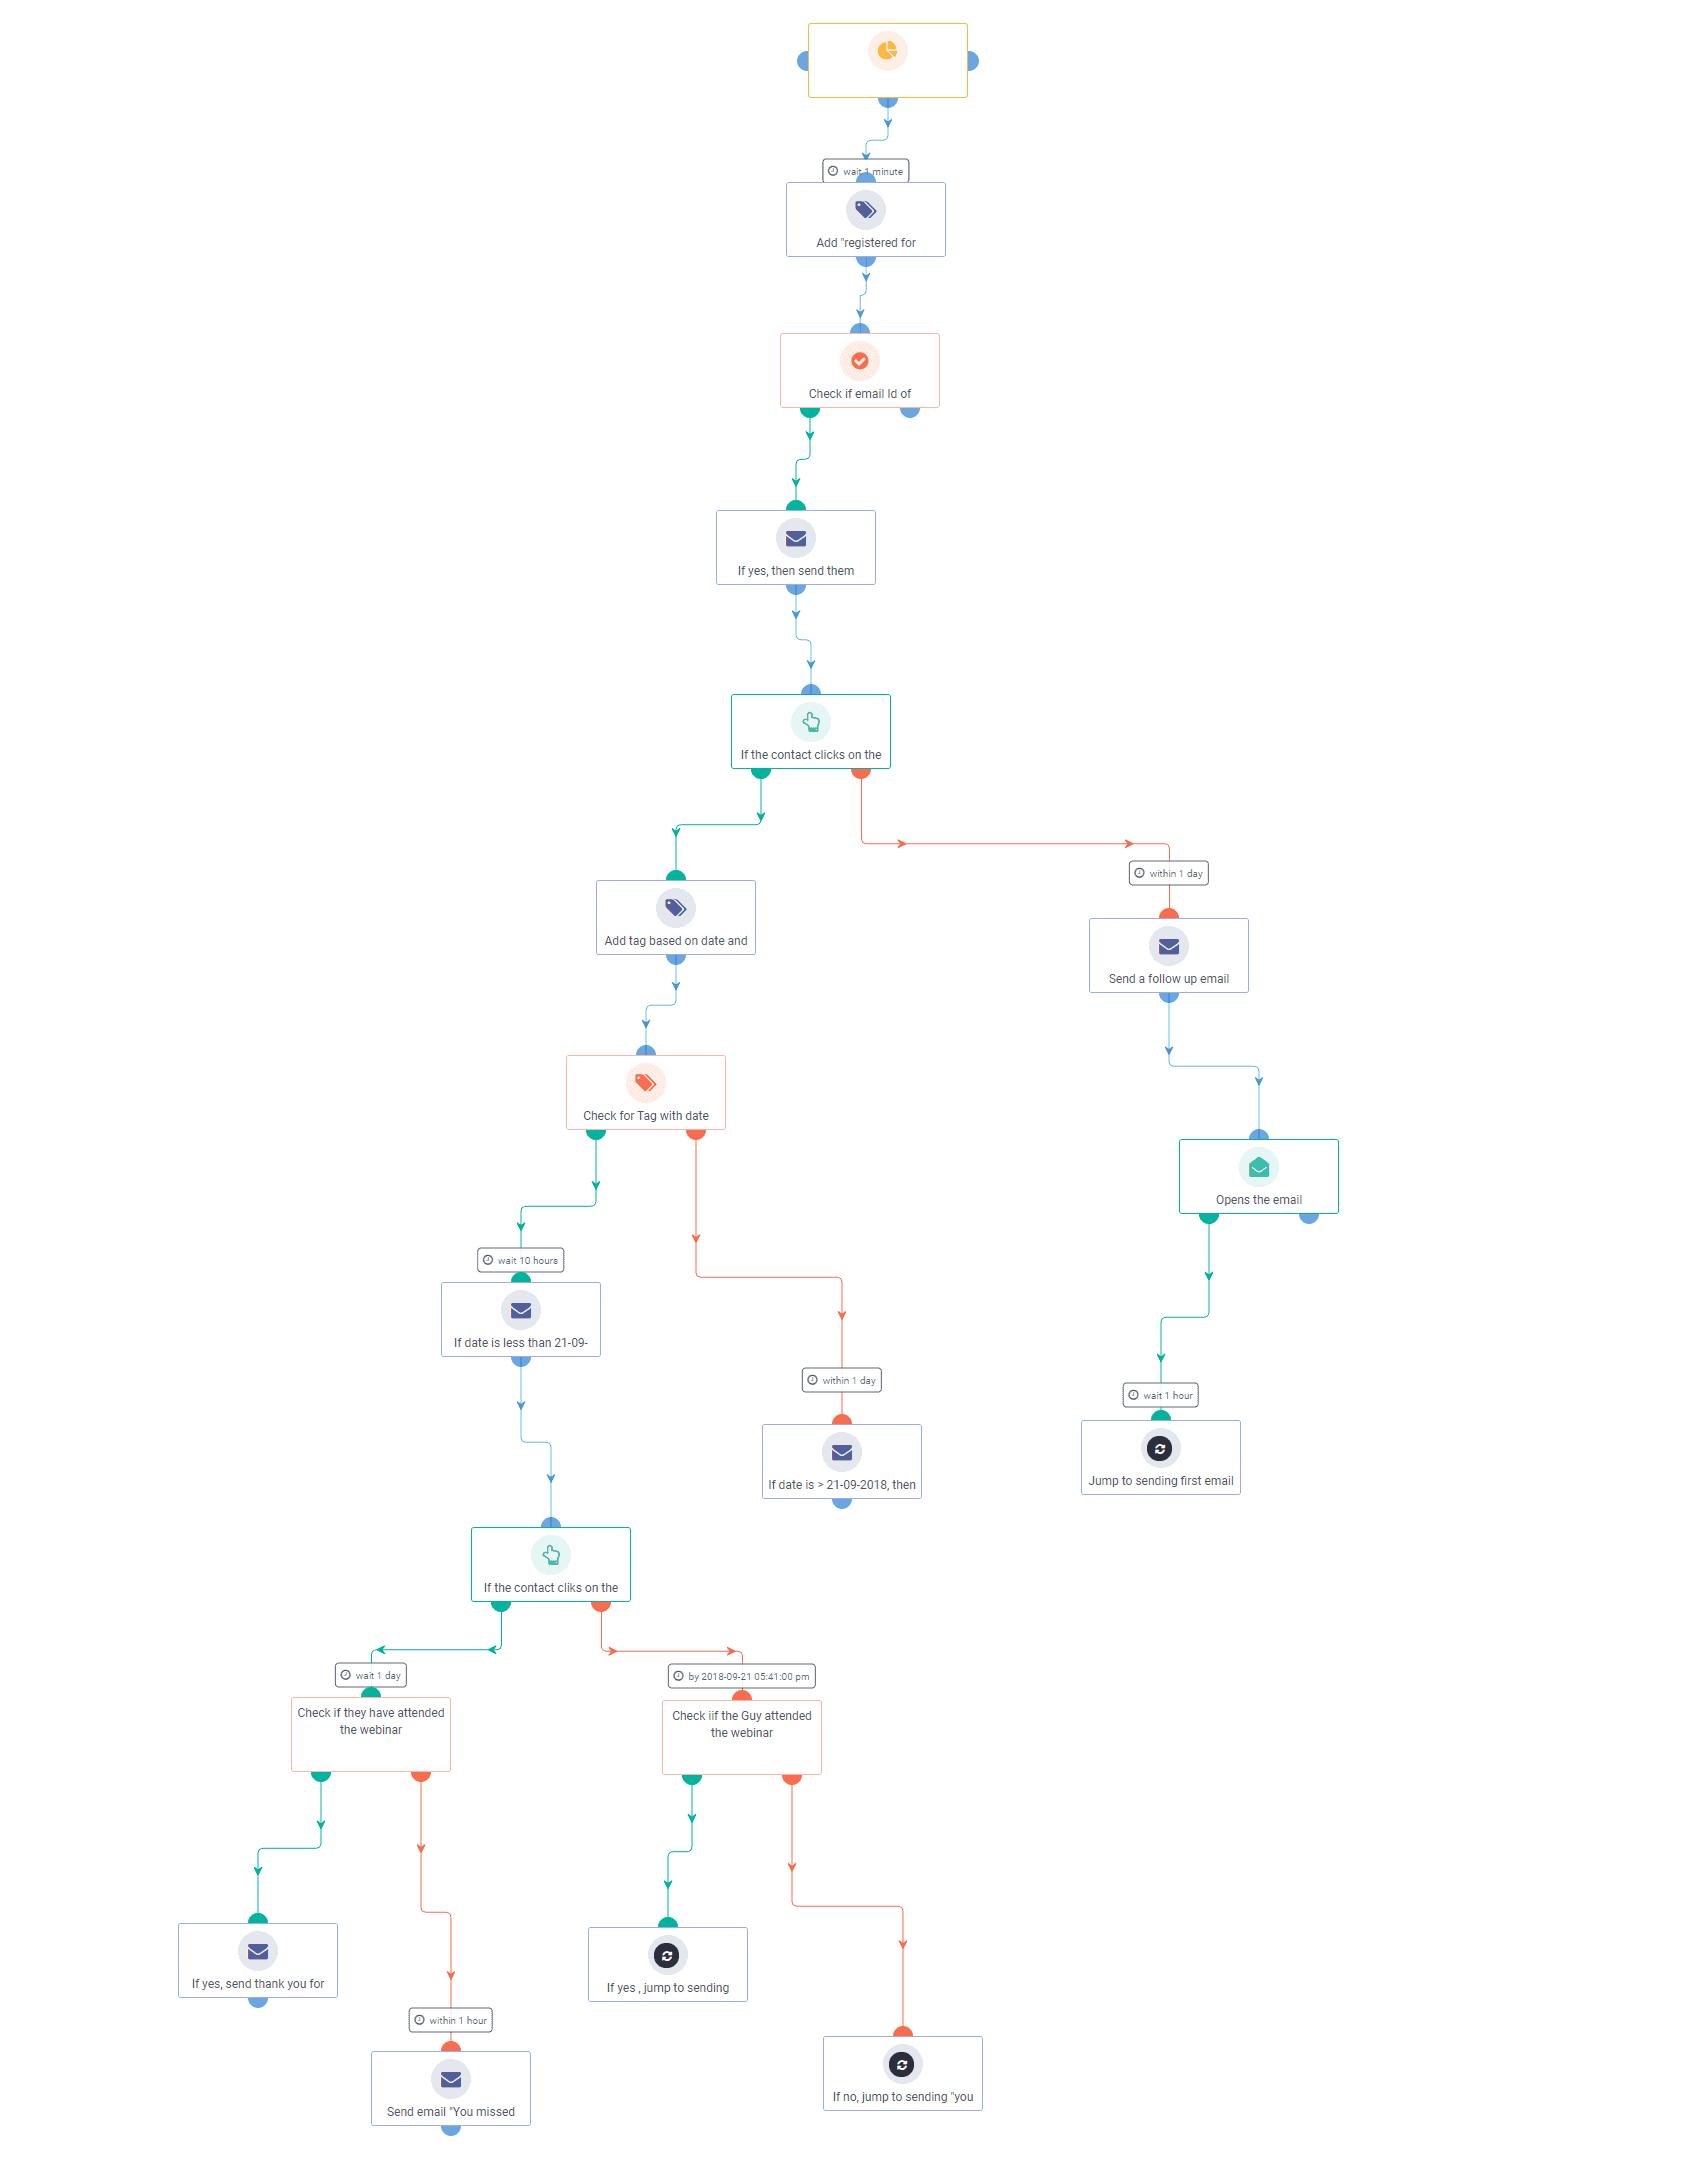 Aritic Webinar Registration Follow-up